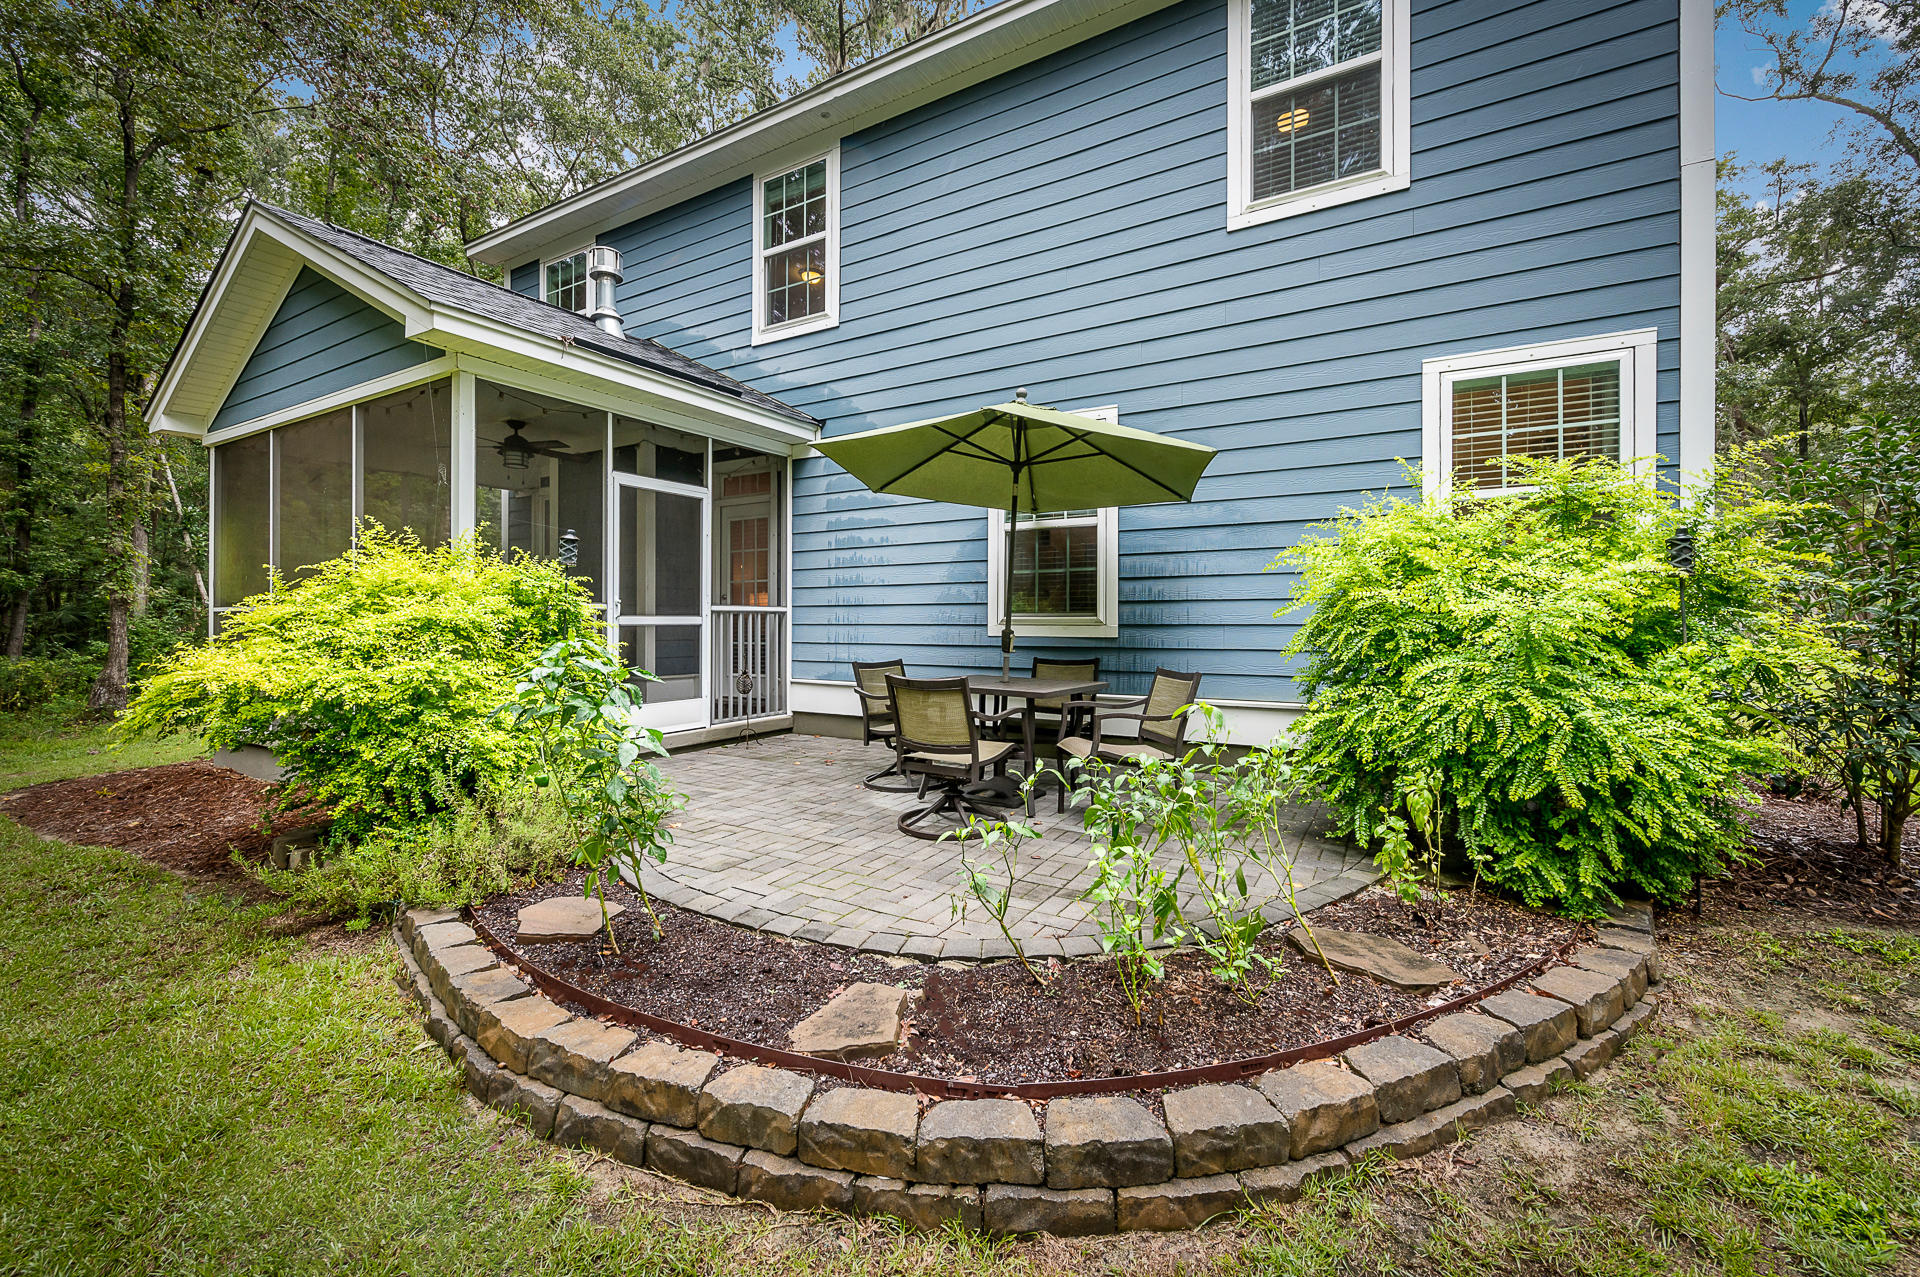 Waterloo Estates Homes For Sale - 3018 Olivia Marie, Johns Island, SC - 9